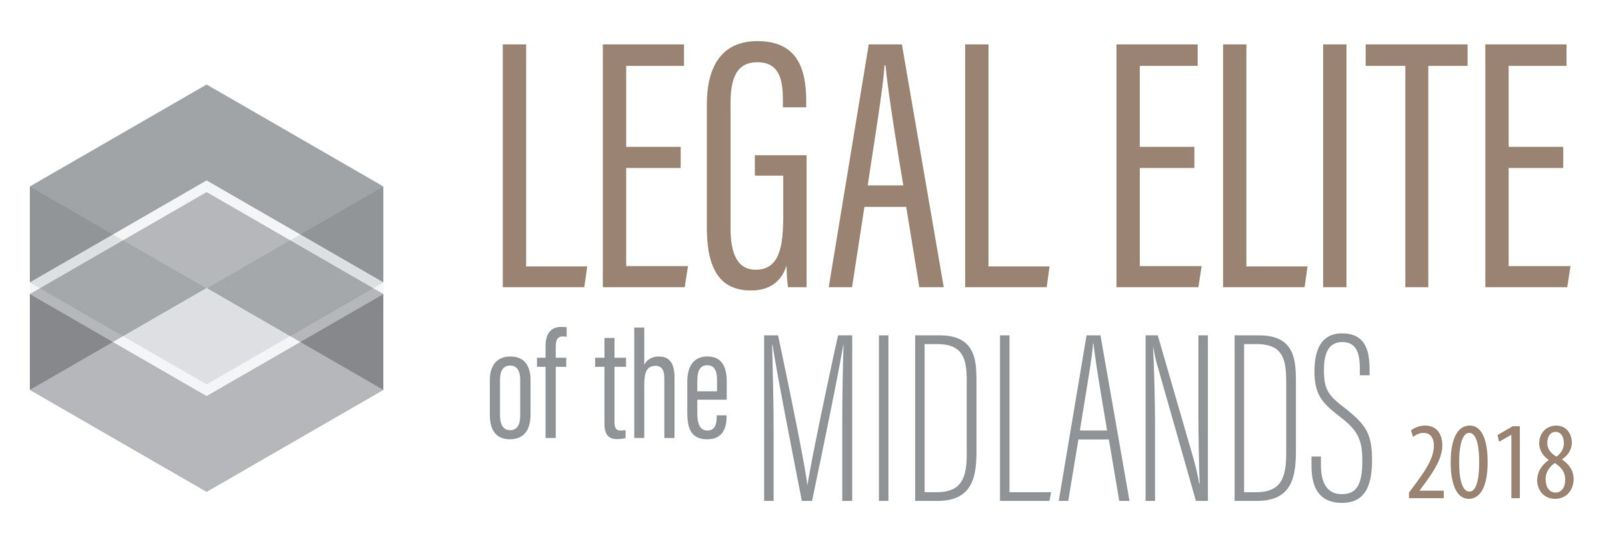 2018 Legal Elite of the Midlands